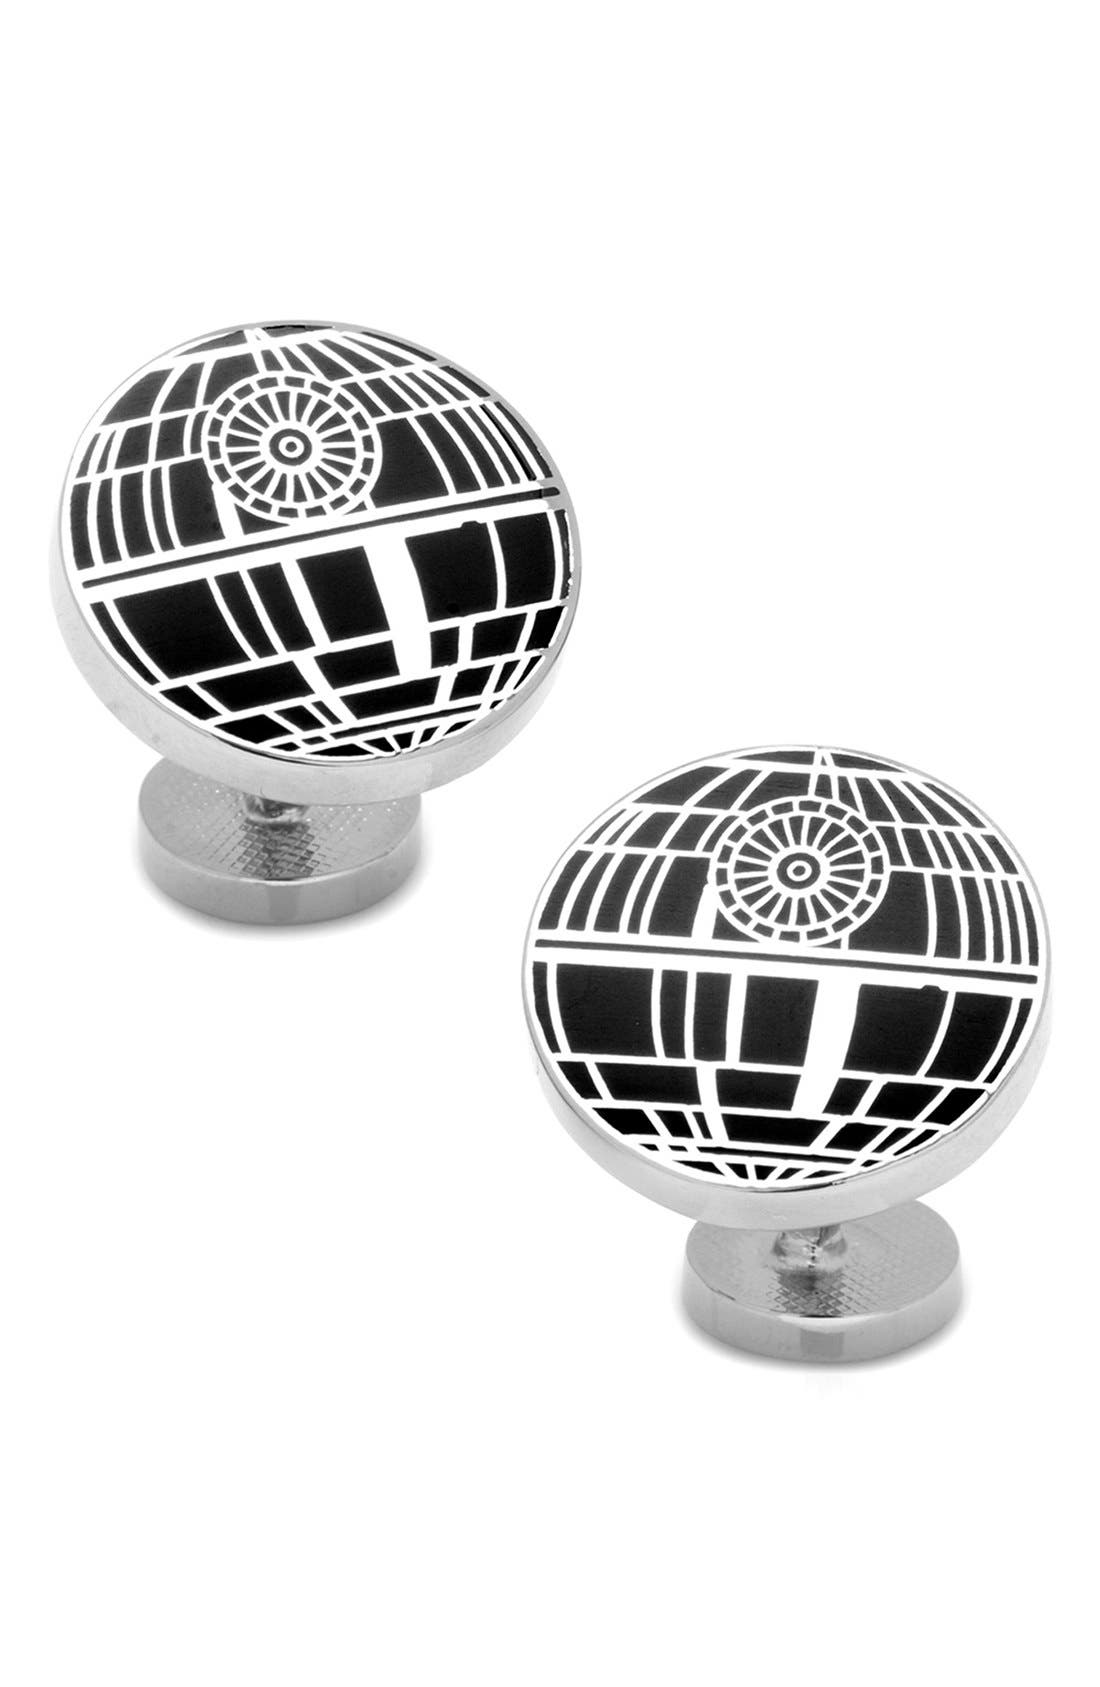 'Star Wars<sup>™</sup> - Death Star' Cuff Links,                             Main thumbnail 1, color,                             Black/ Silver